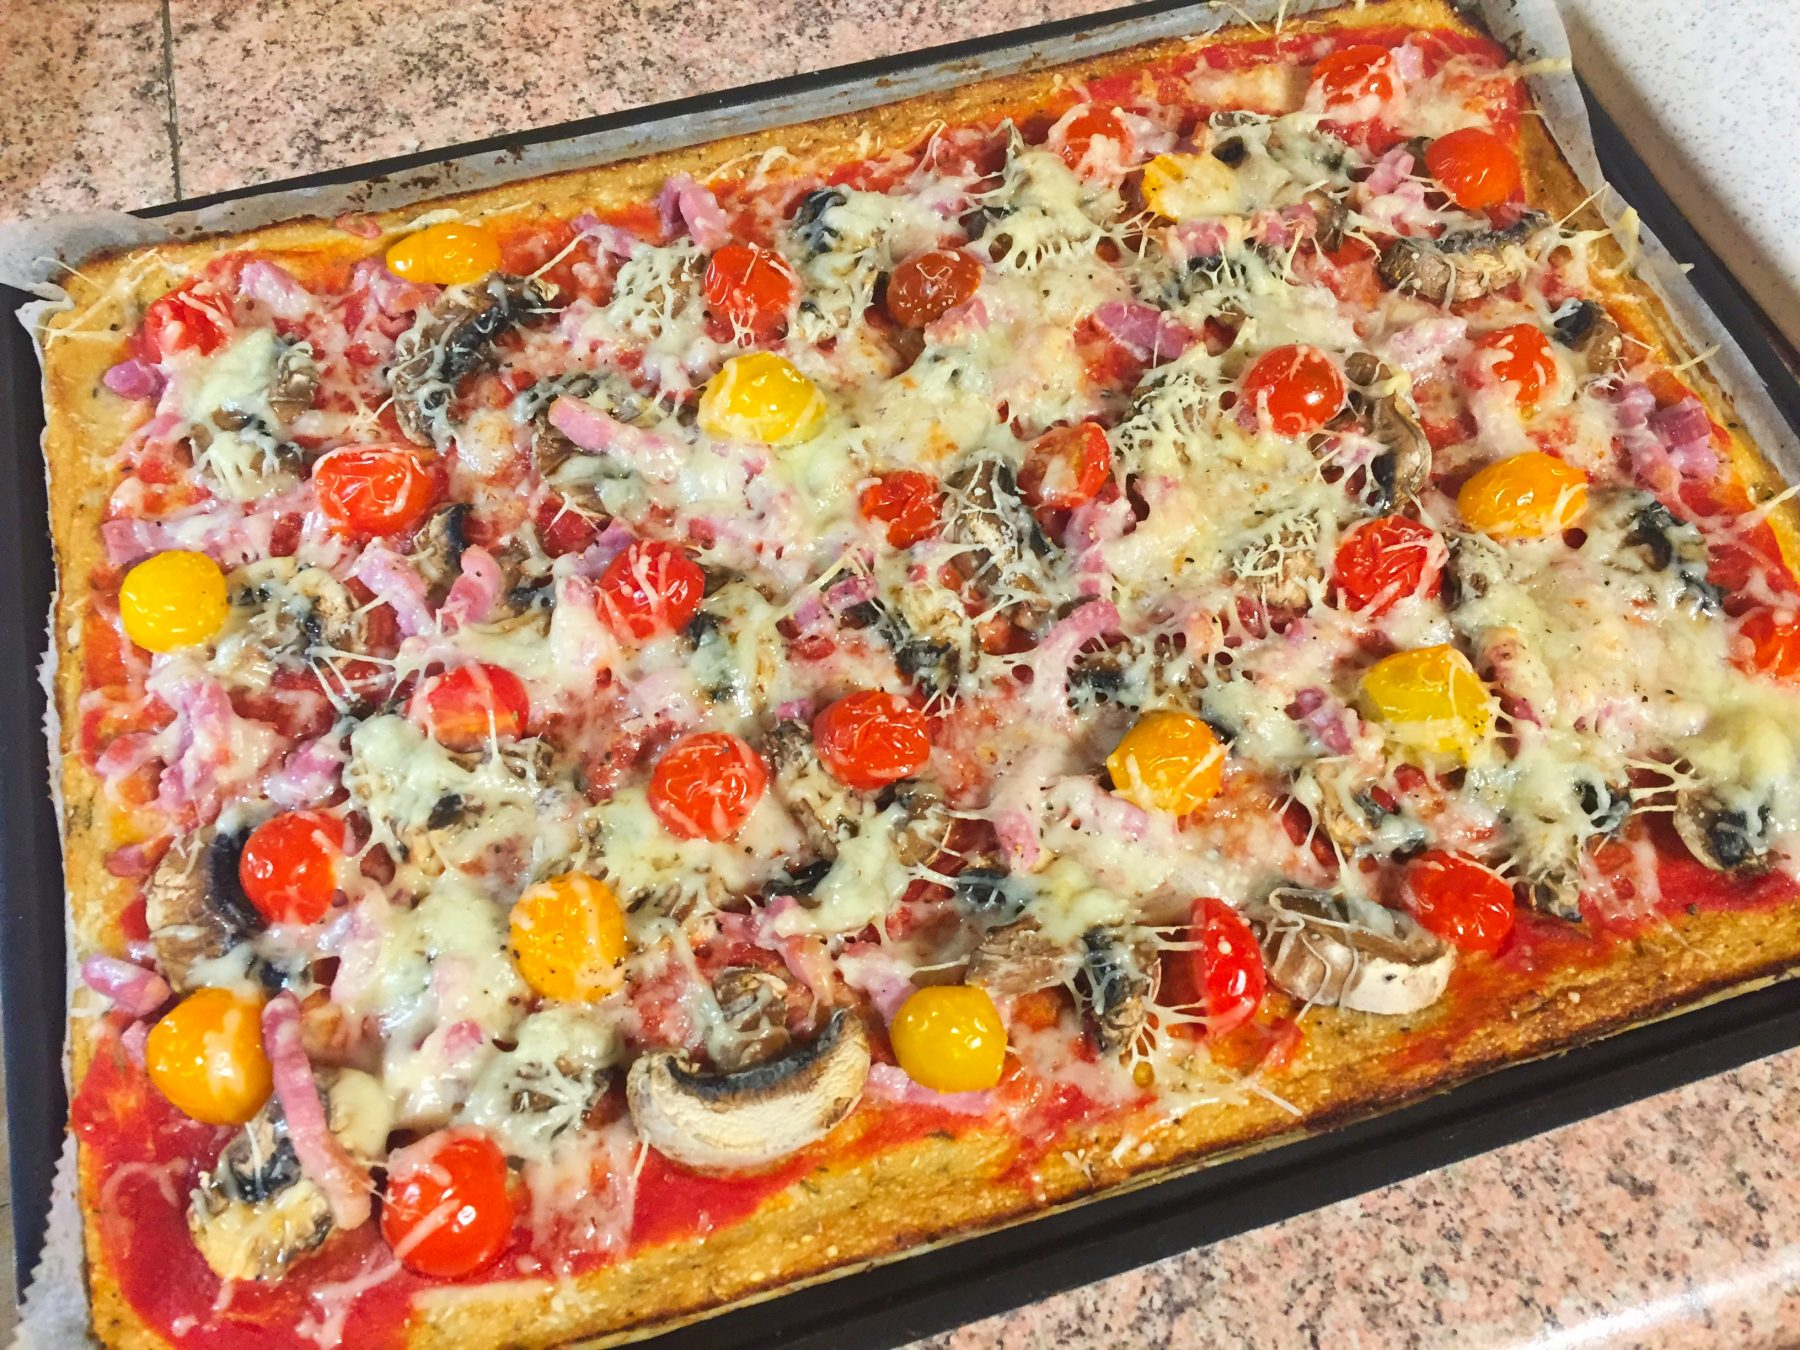 IMG 3571 - Pizza et sa pâte au chou-fleur (sans farine)